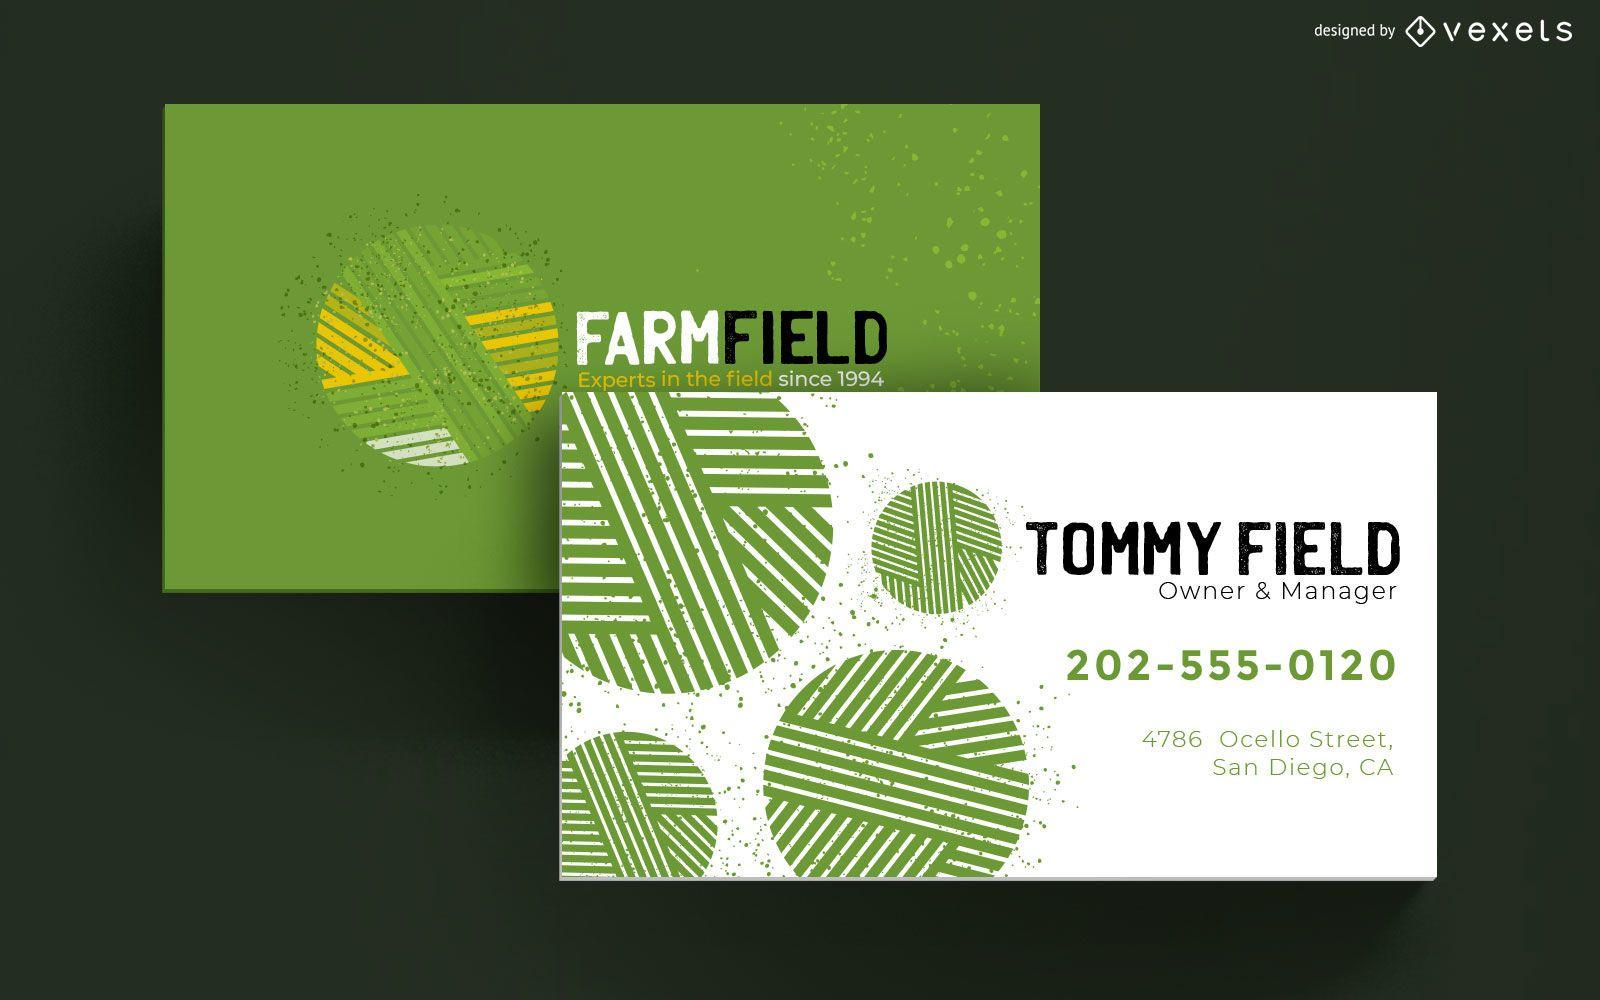 Tarjeta de visita de campo de granja